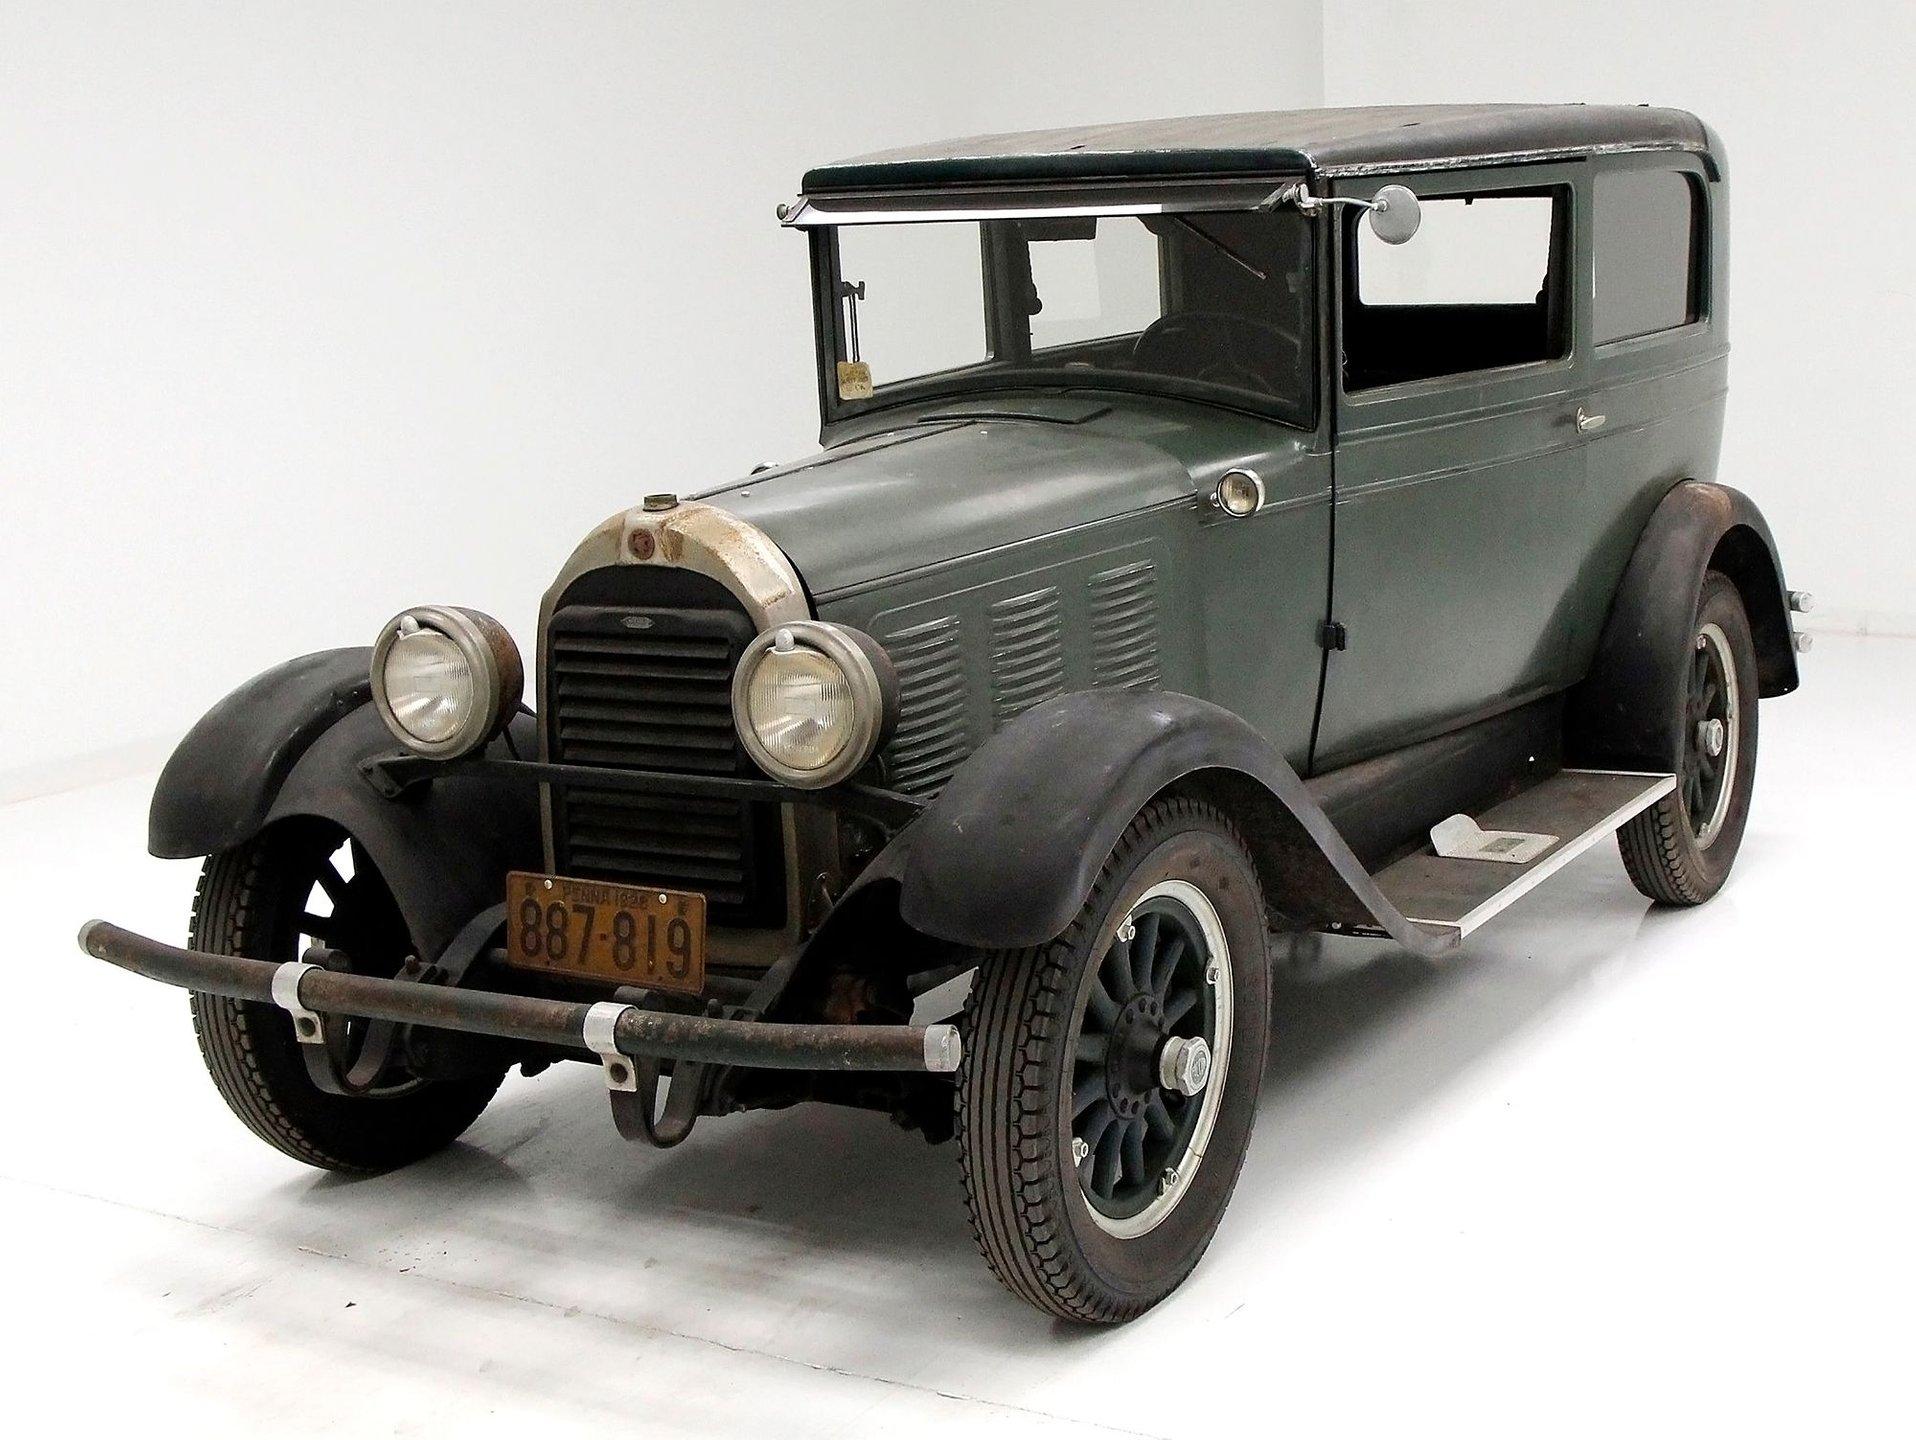 1928 Falcon-Knight Model 12 Sedan